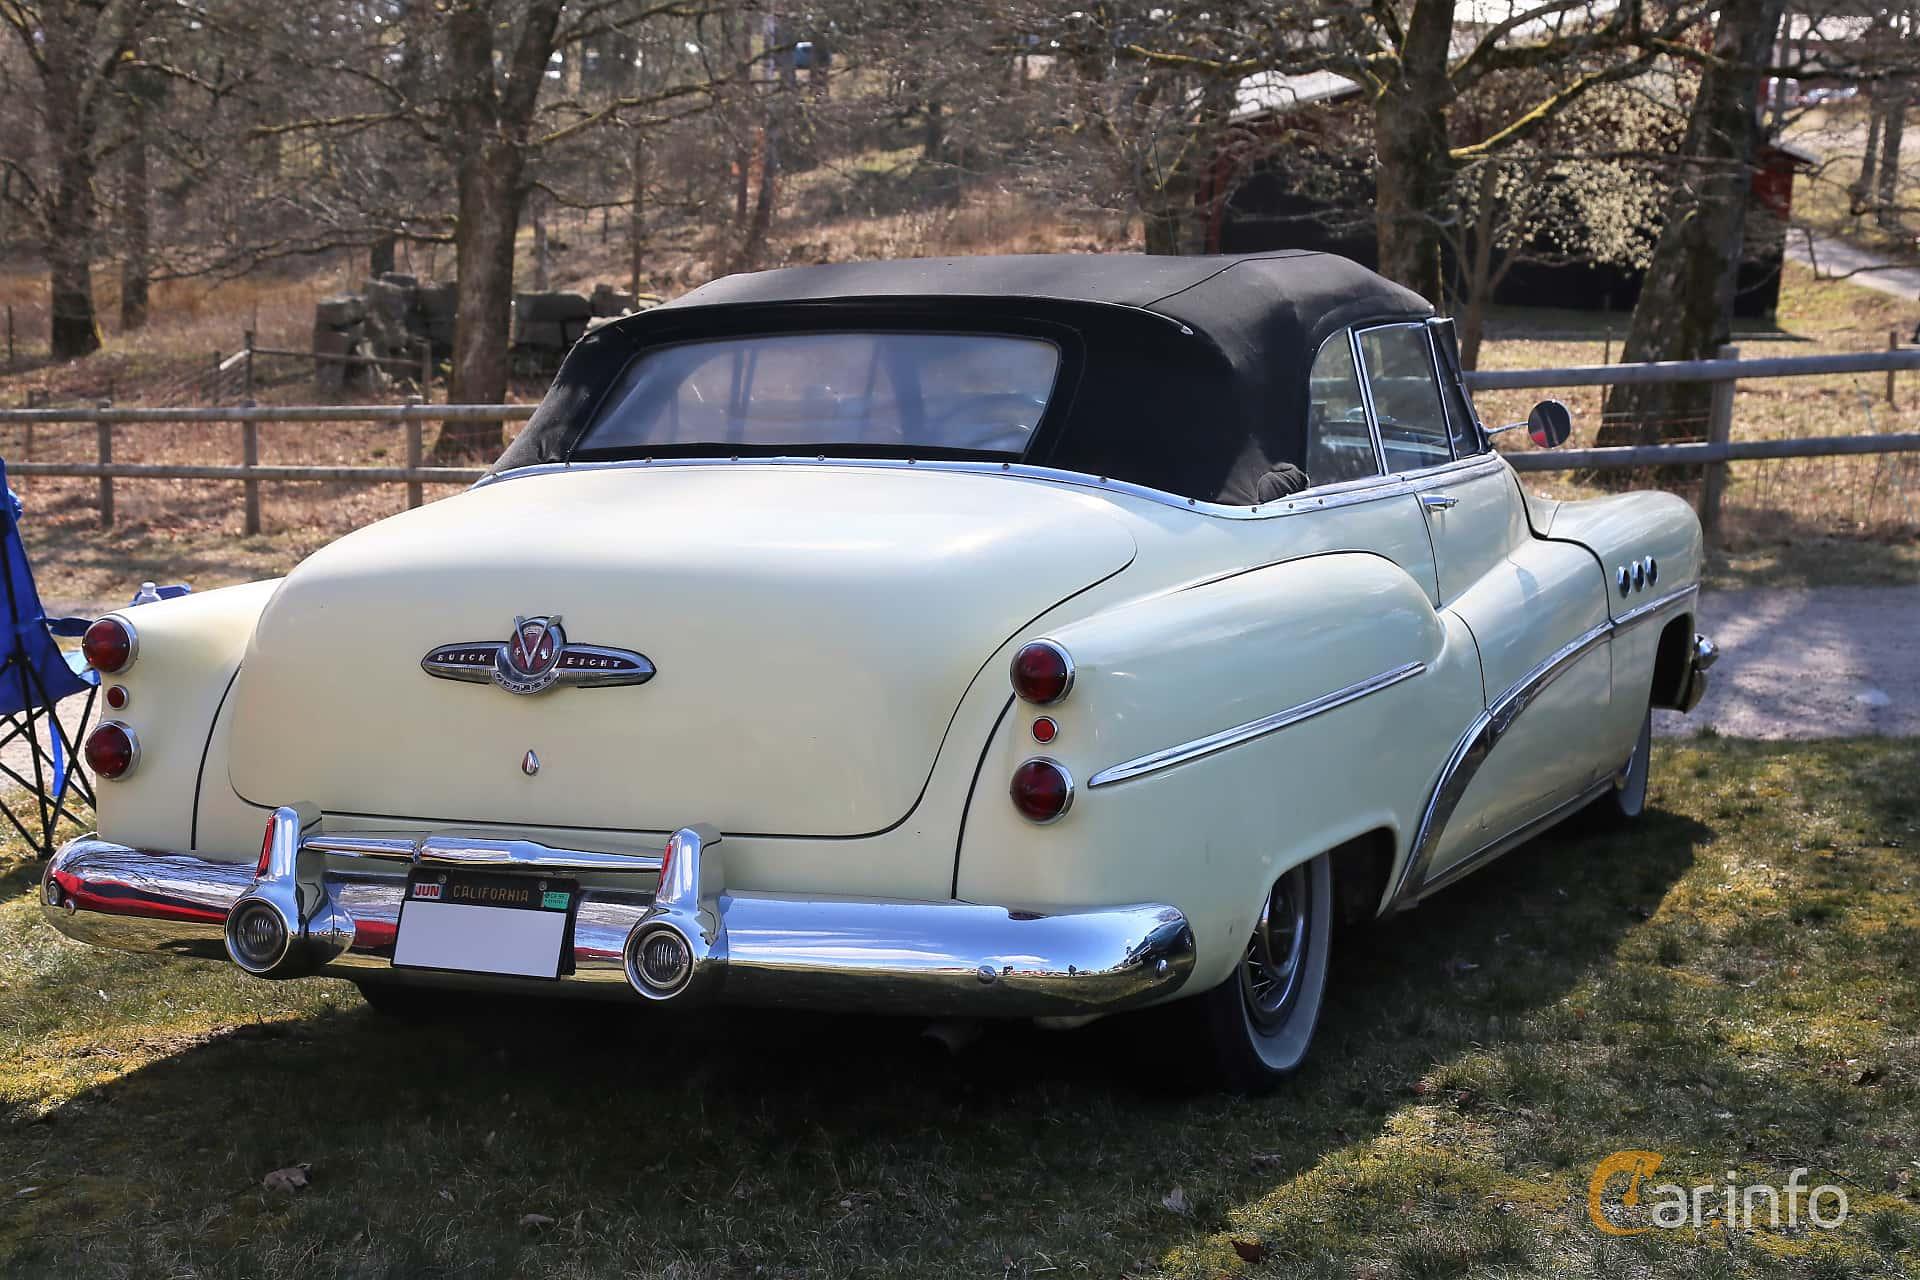 Back/Side of Buick Super Convertible 5.3 V8 Automatic, 172ps, 1953 at Uddevalla Veteranbilsmarknad Backamo, Ljungsk 2019